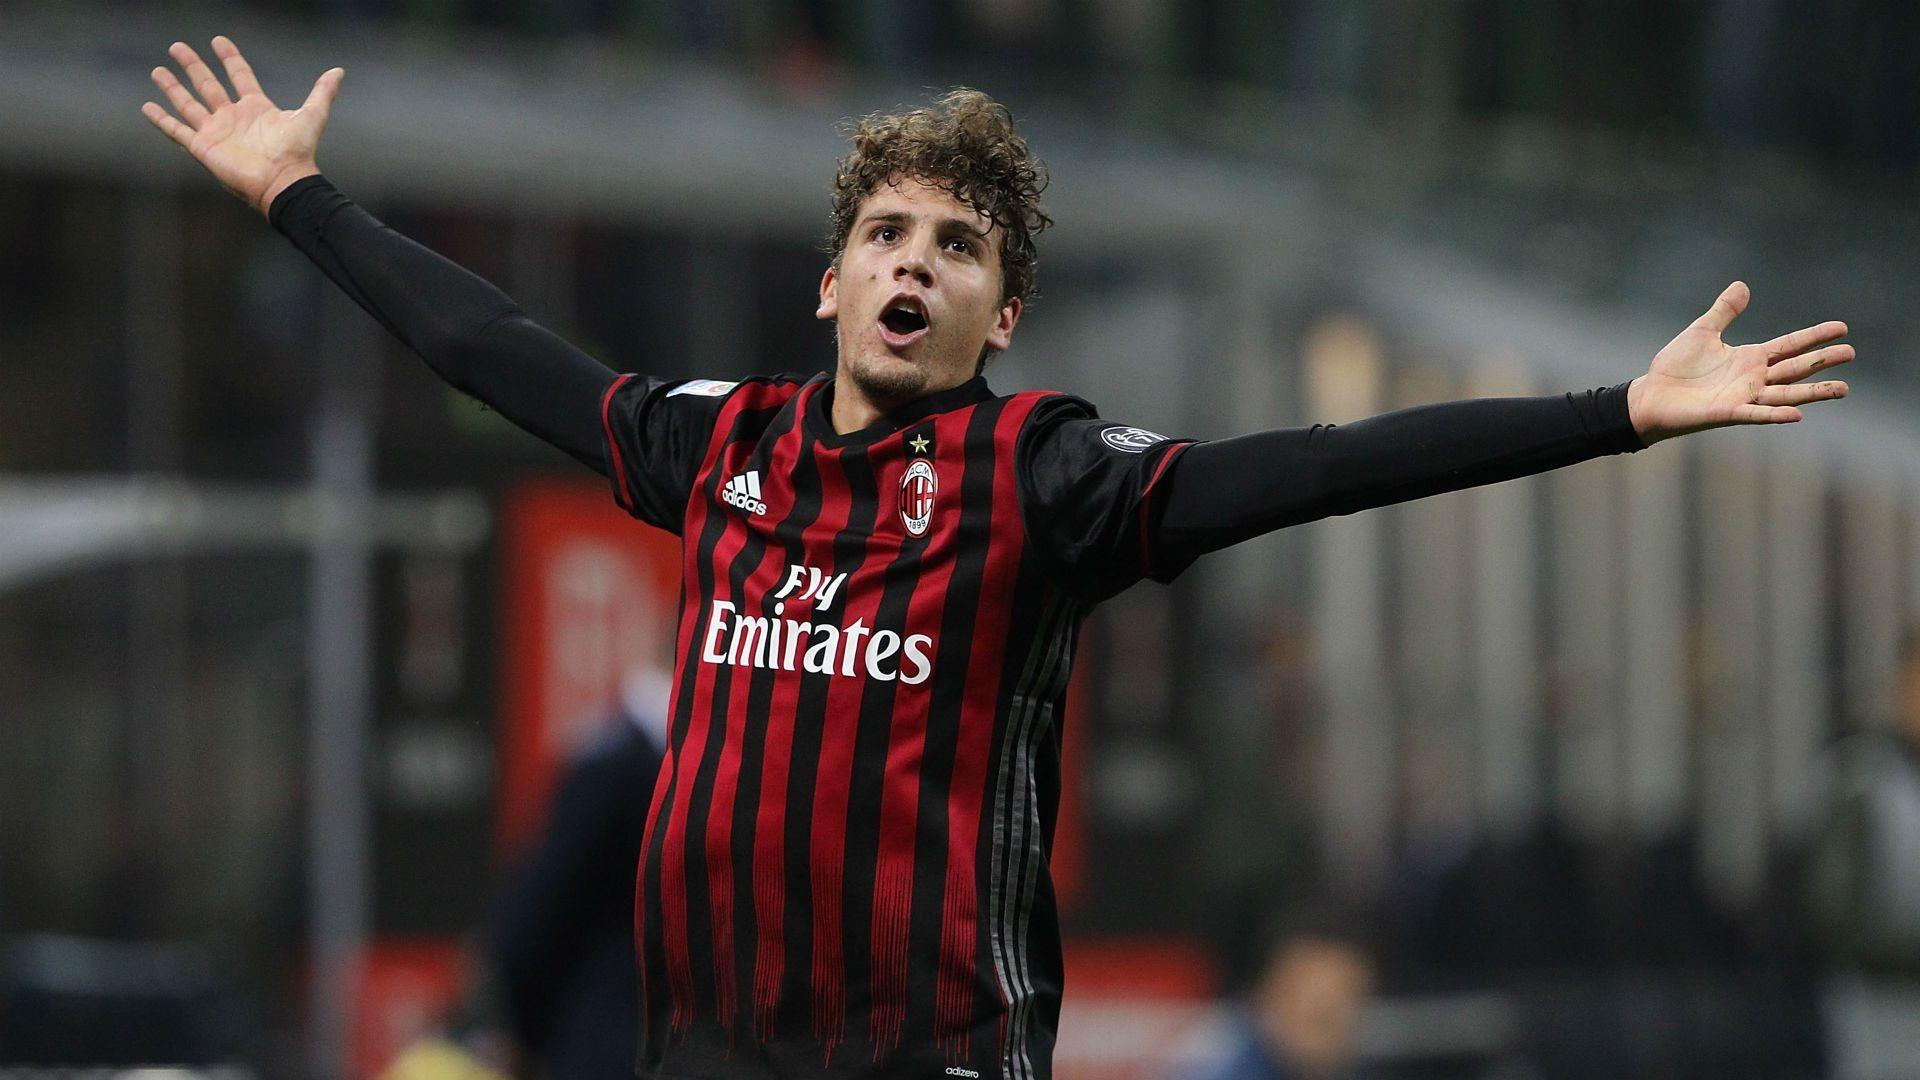 AC Milan Background images